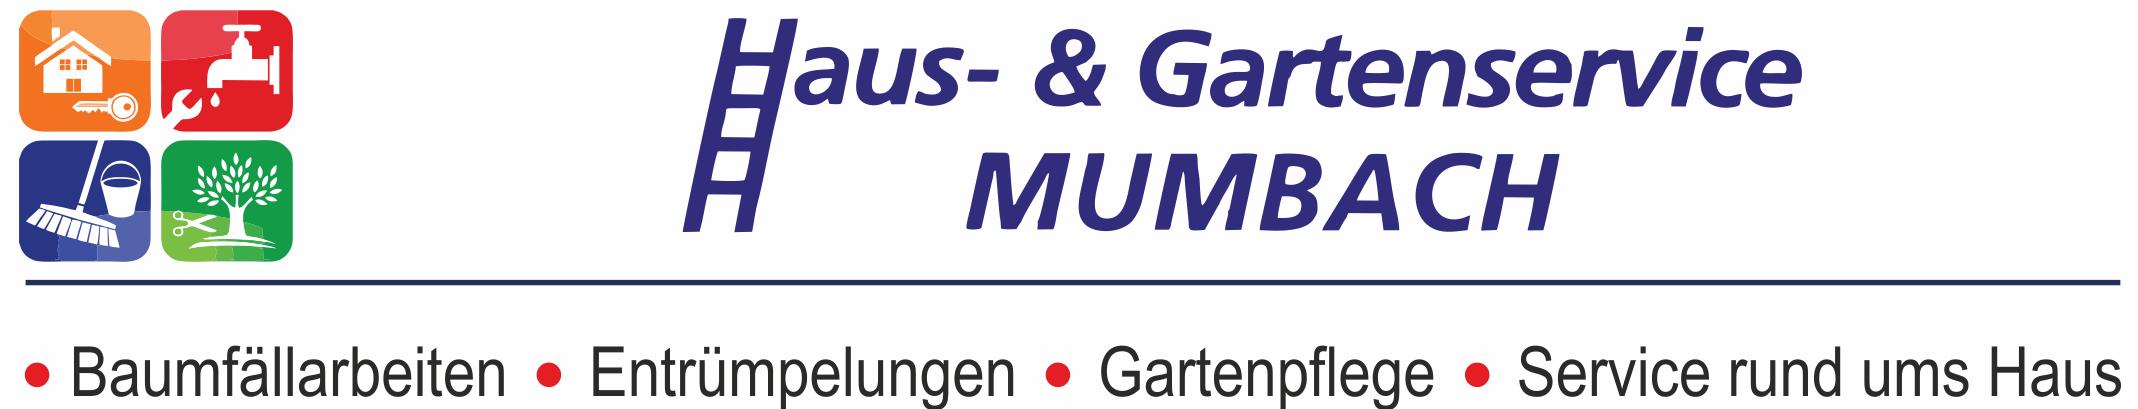 Haus- & Gartenservice Mumbach